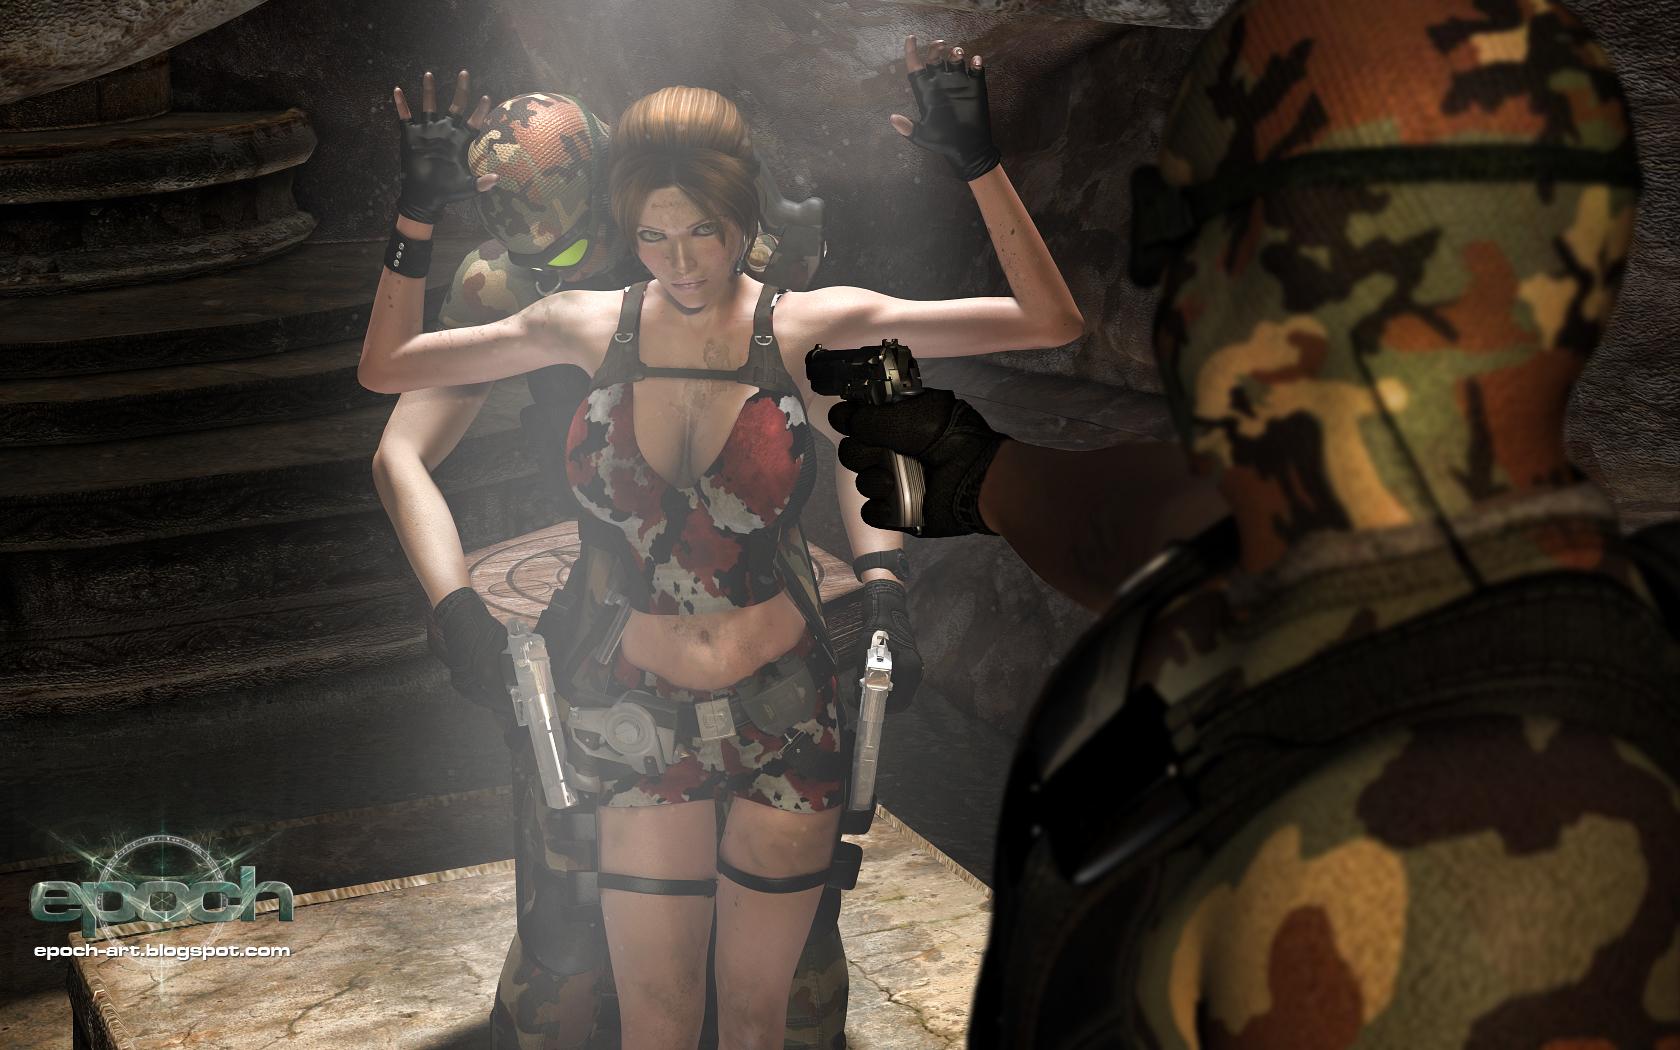 Porn lara croft with aliens henati porn pictures